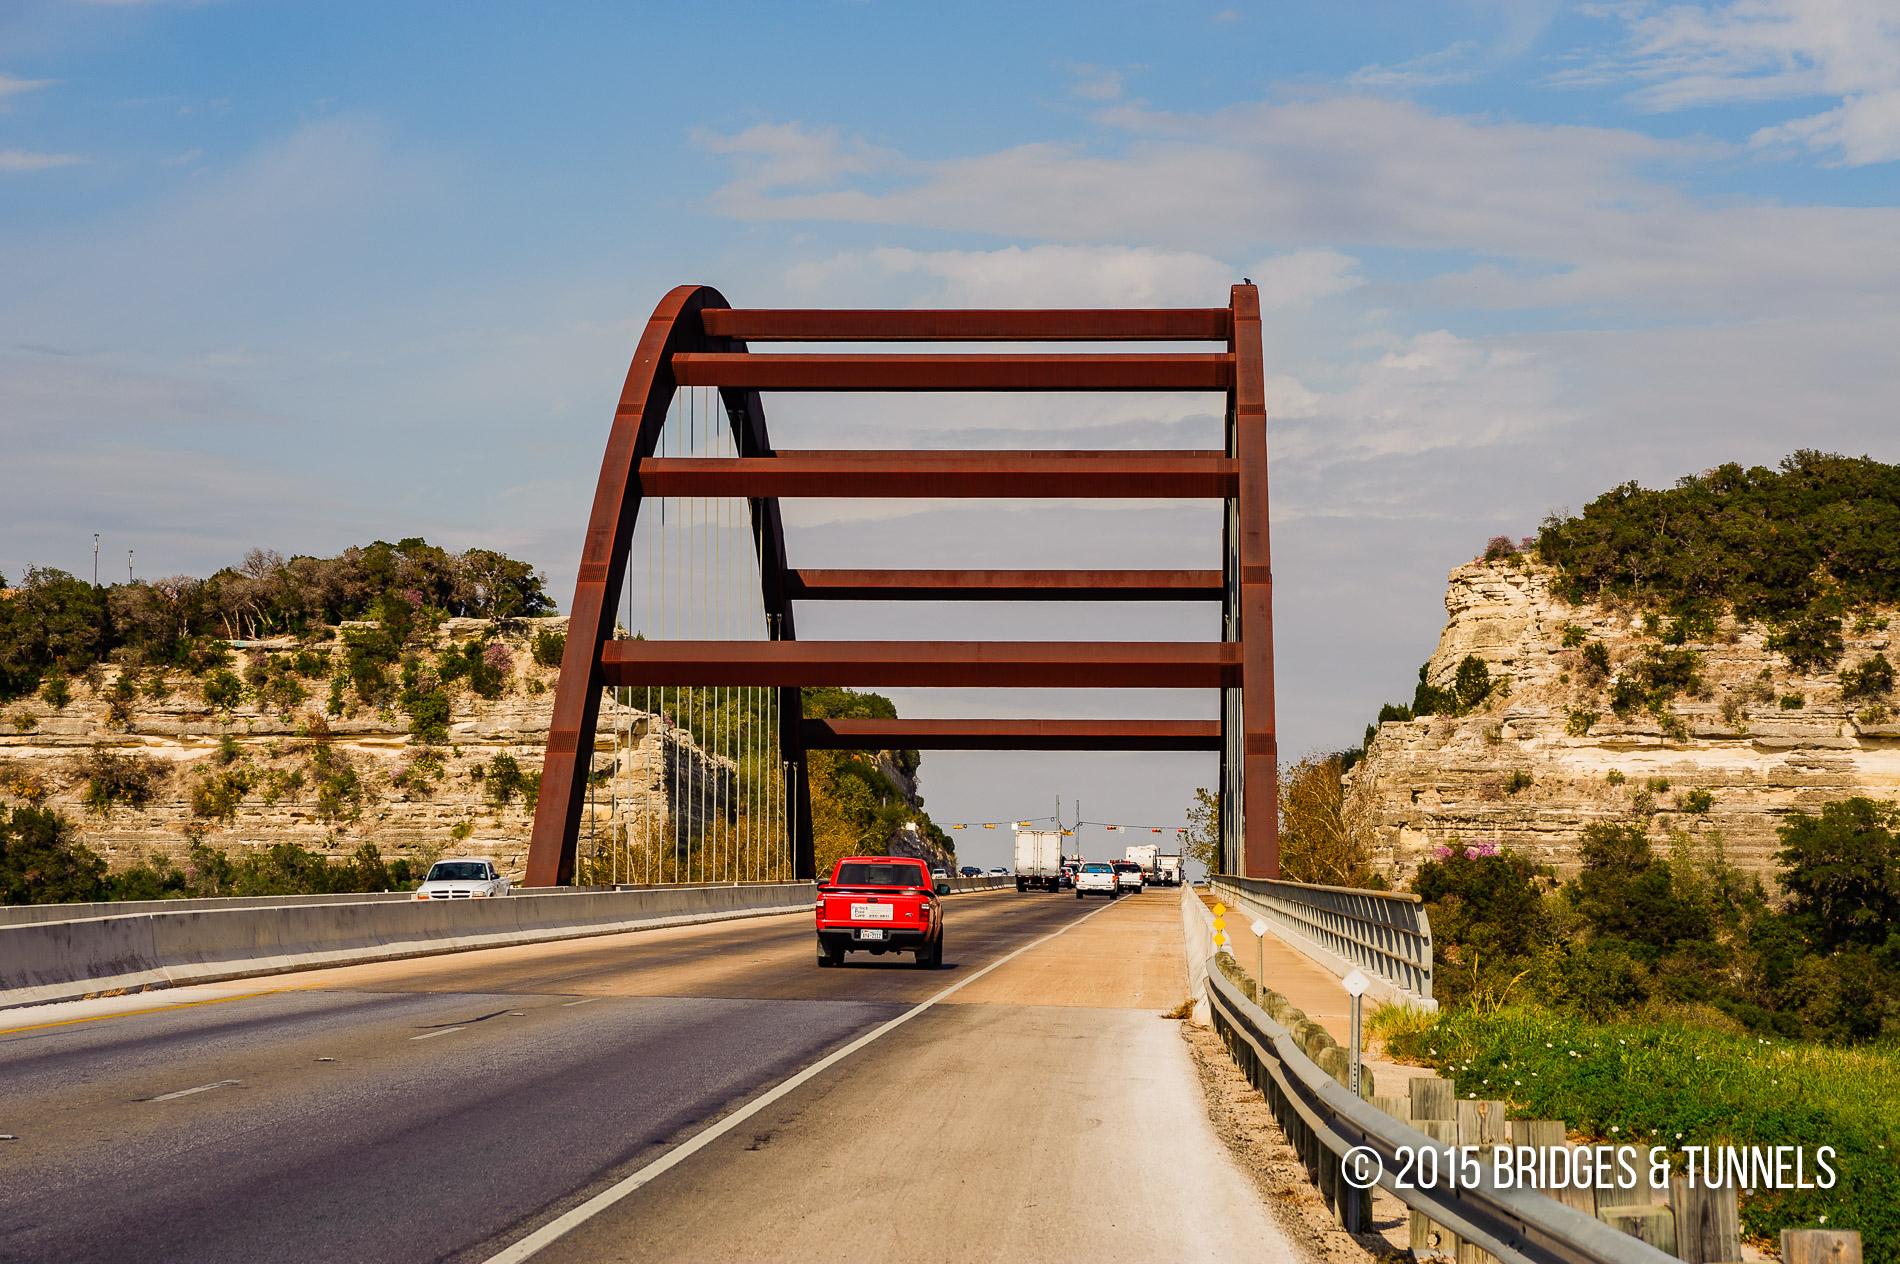 Pennybacker Bridge (TX Loop 360)